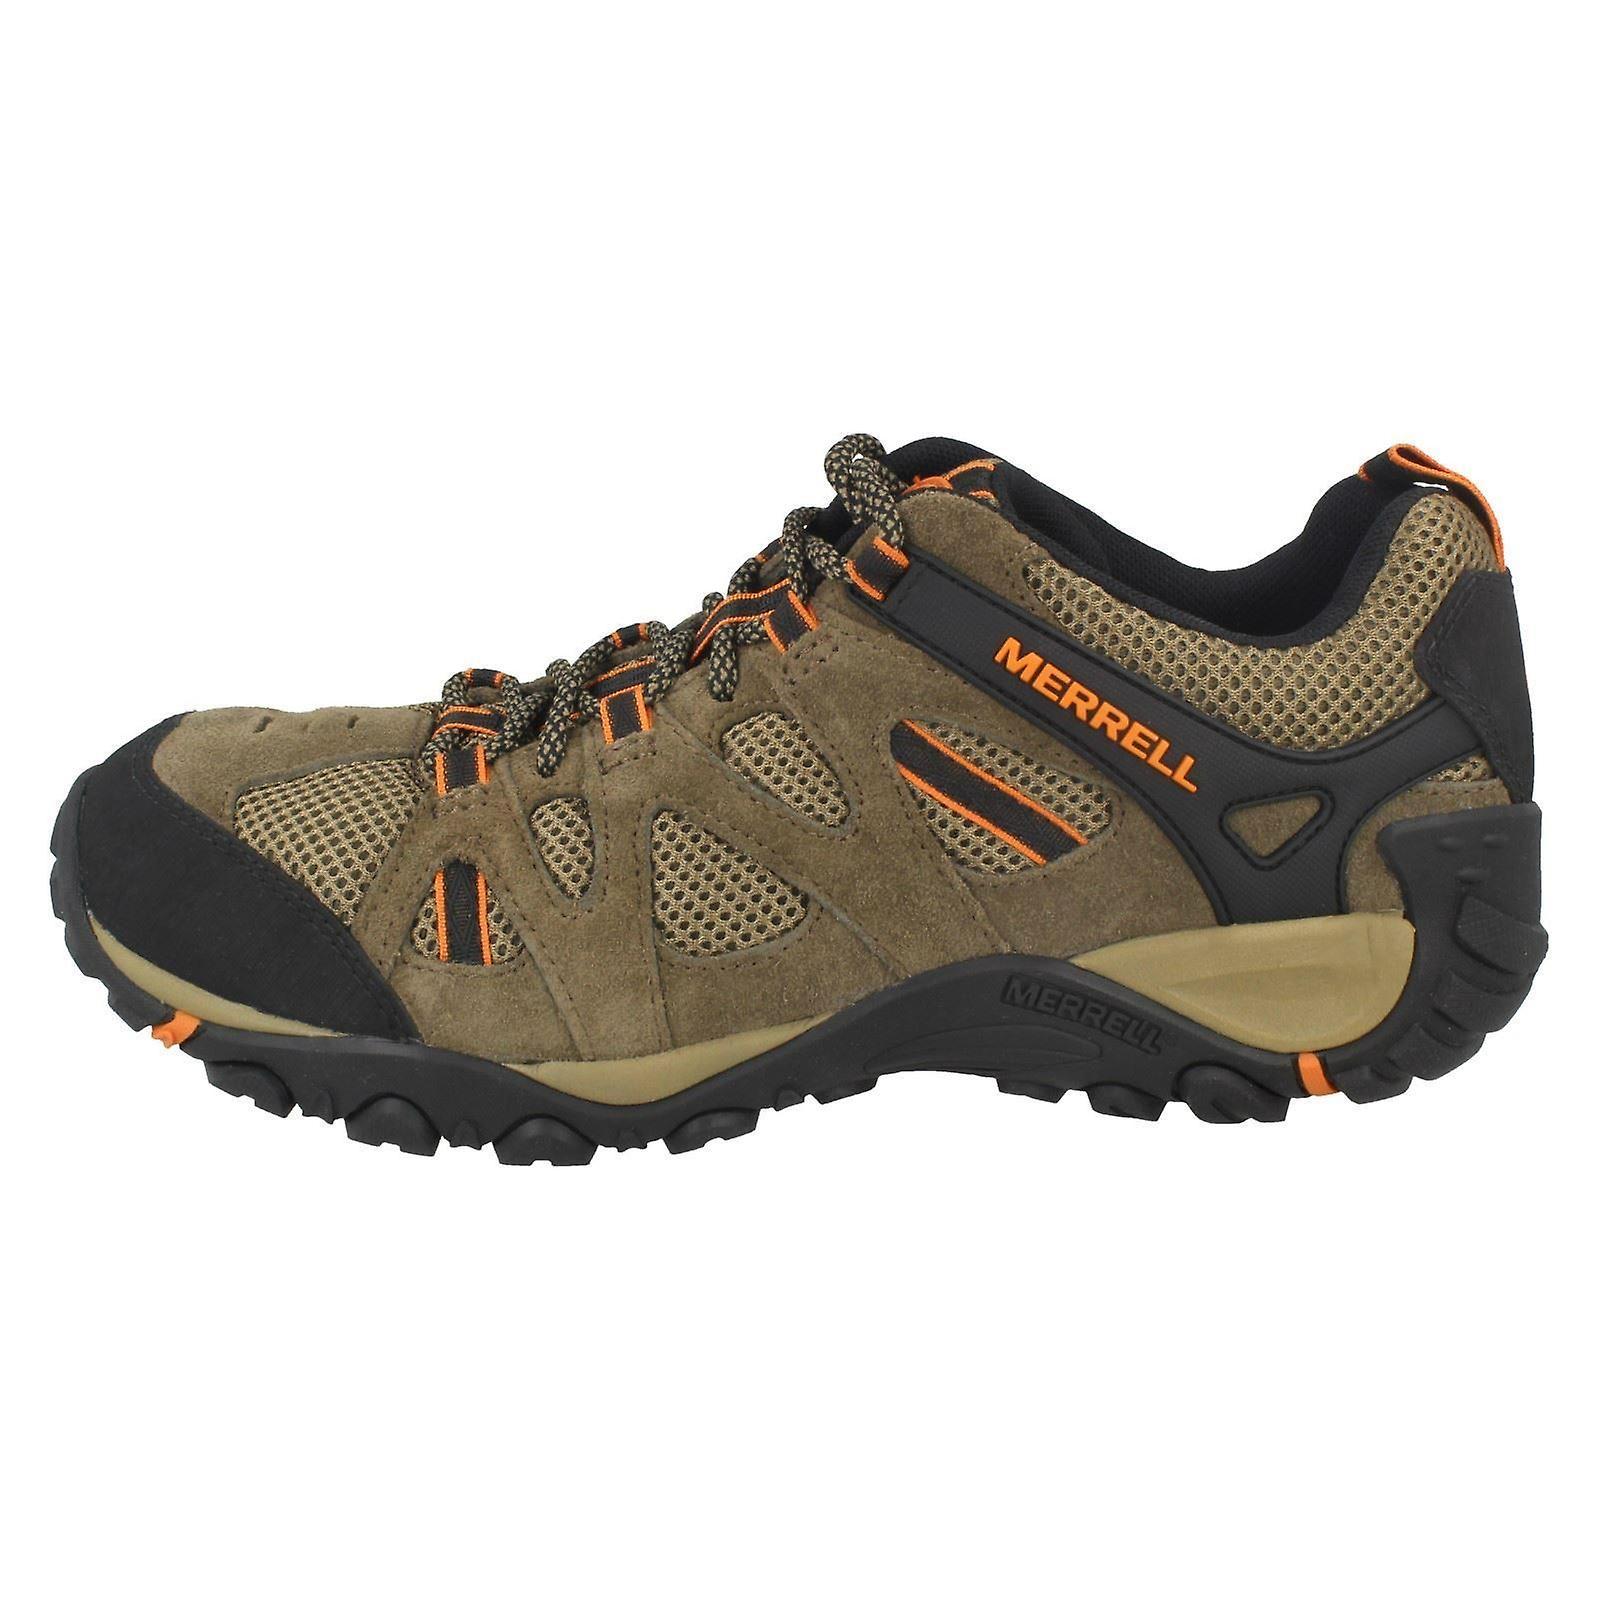 s Merrell Walking chaussures Yokota Ascender évent J343718C - 8M Cantine/B. cuir Orange - UK taille 8M - - UE taille 42 - taille US 8.5 cad773